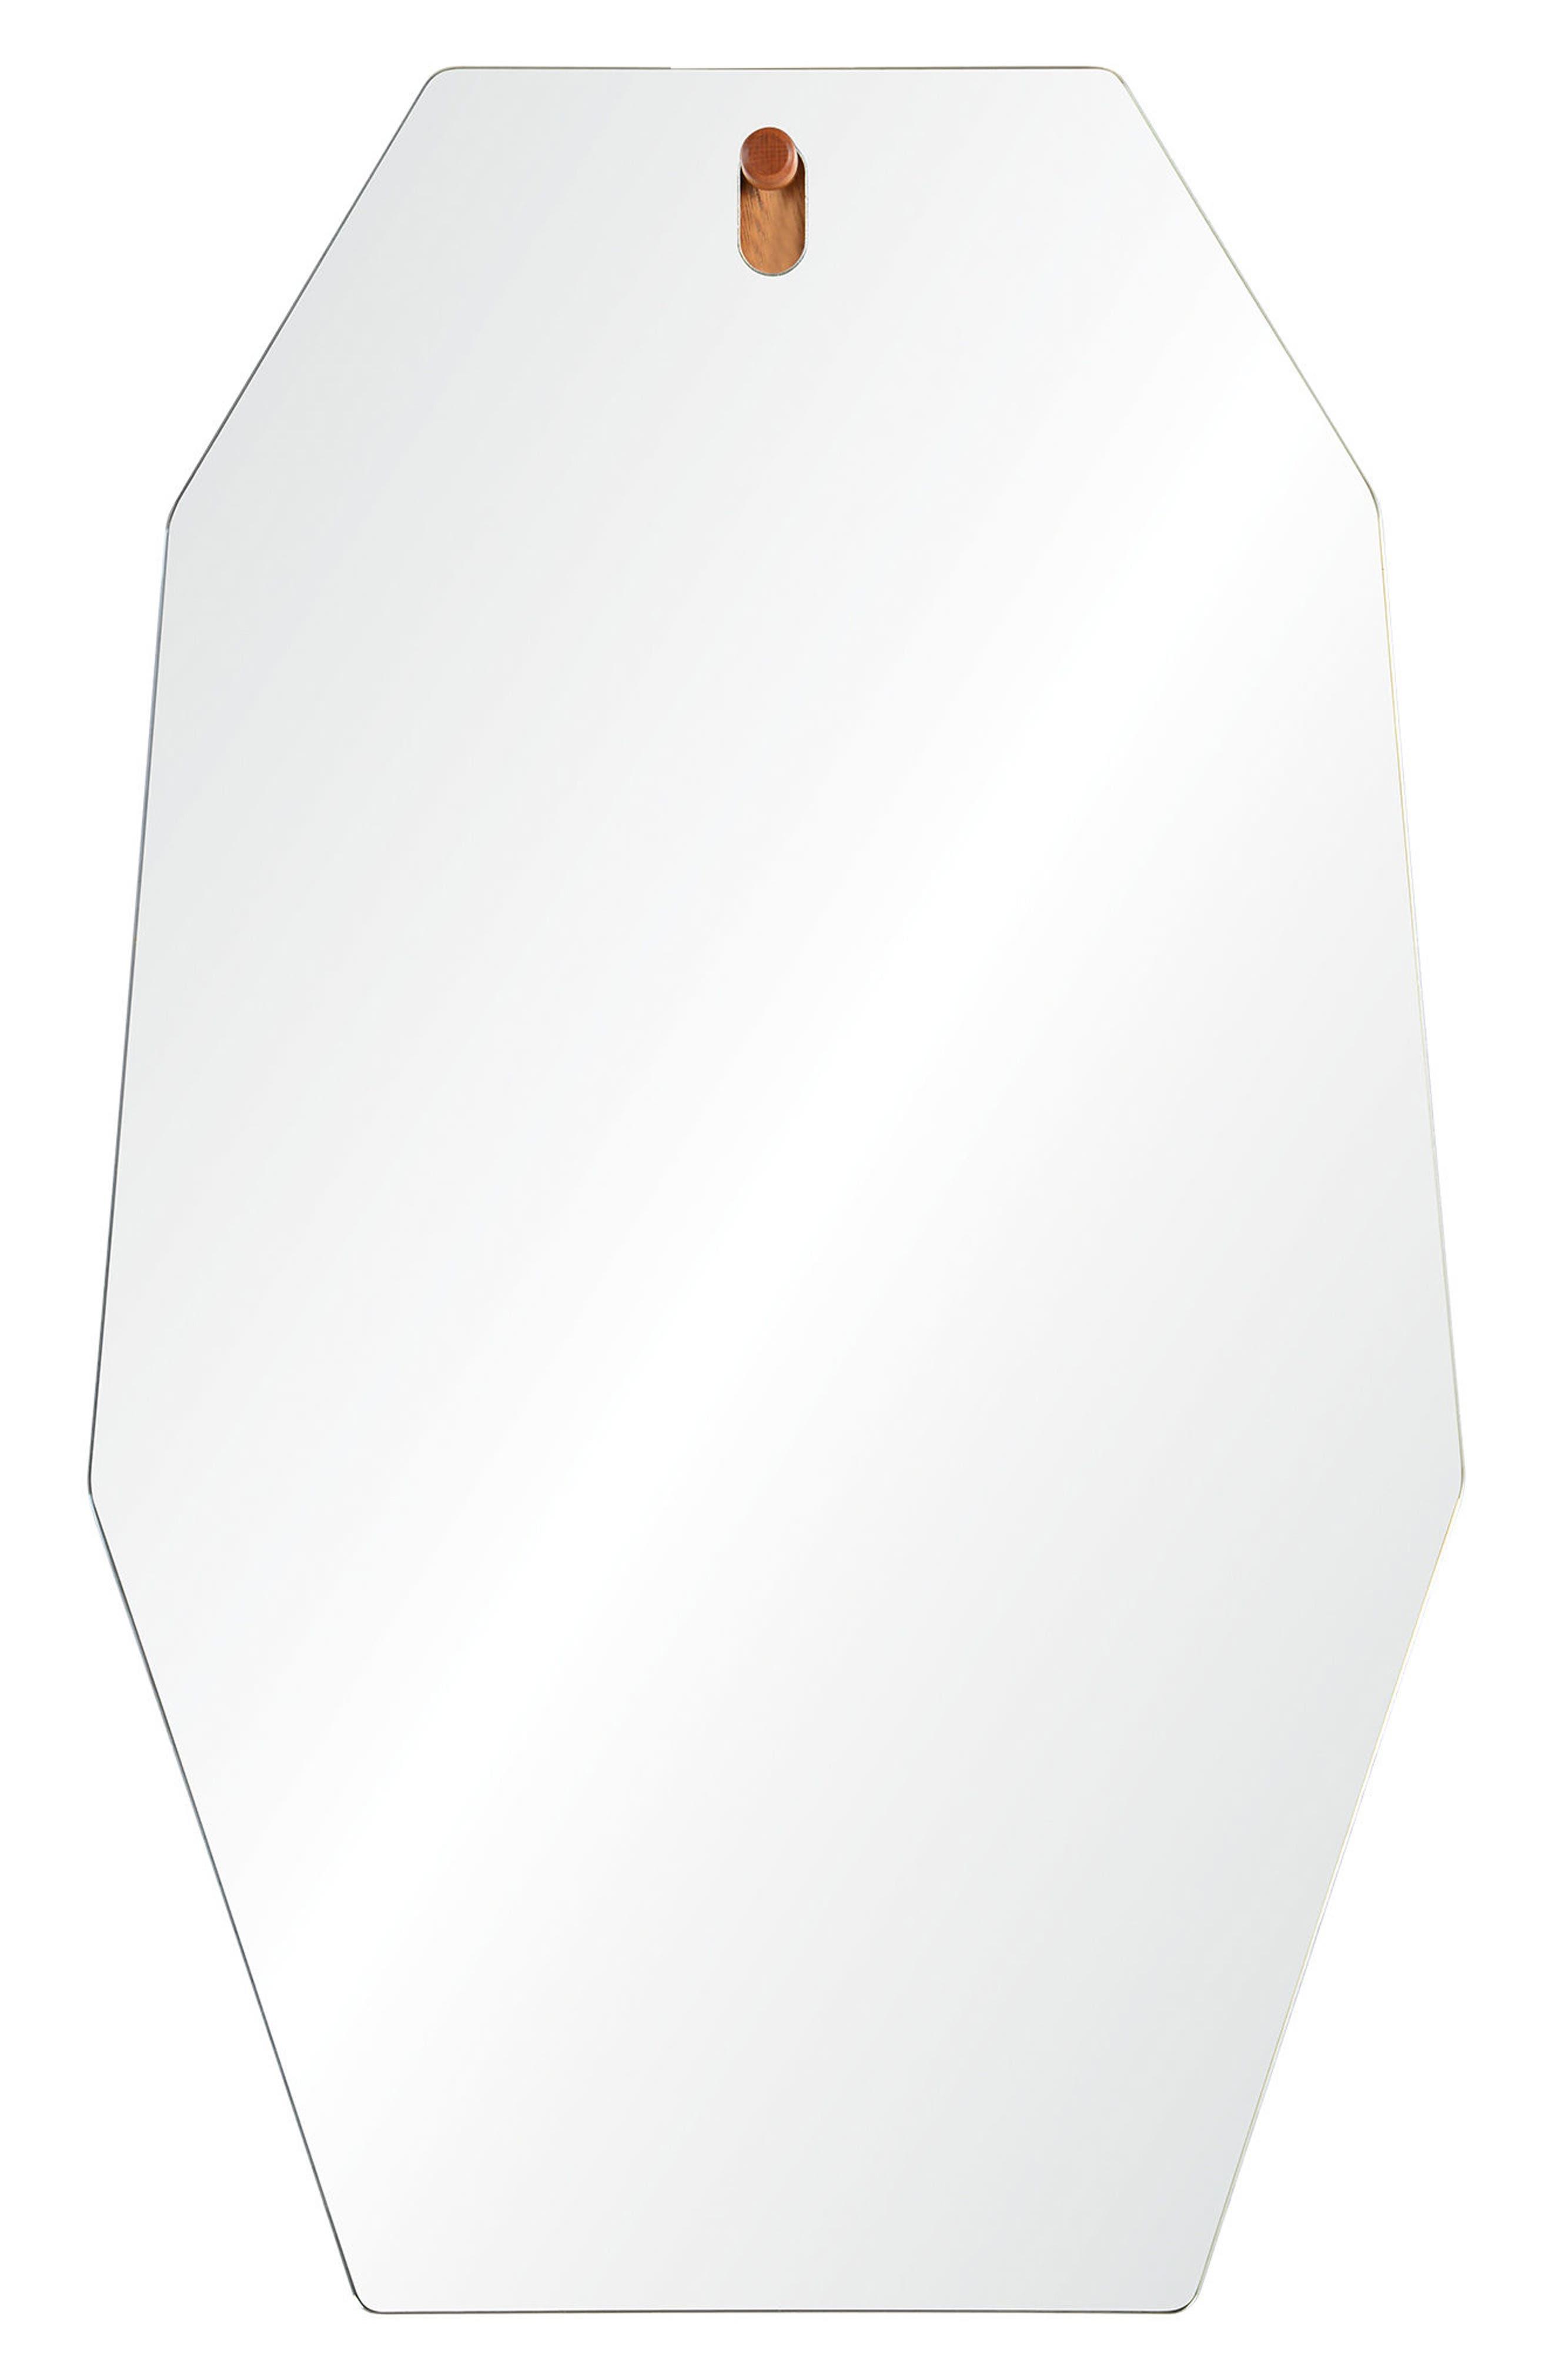 Main Image - Renwil Apse Mirror